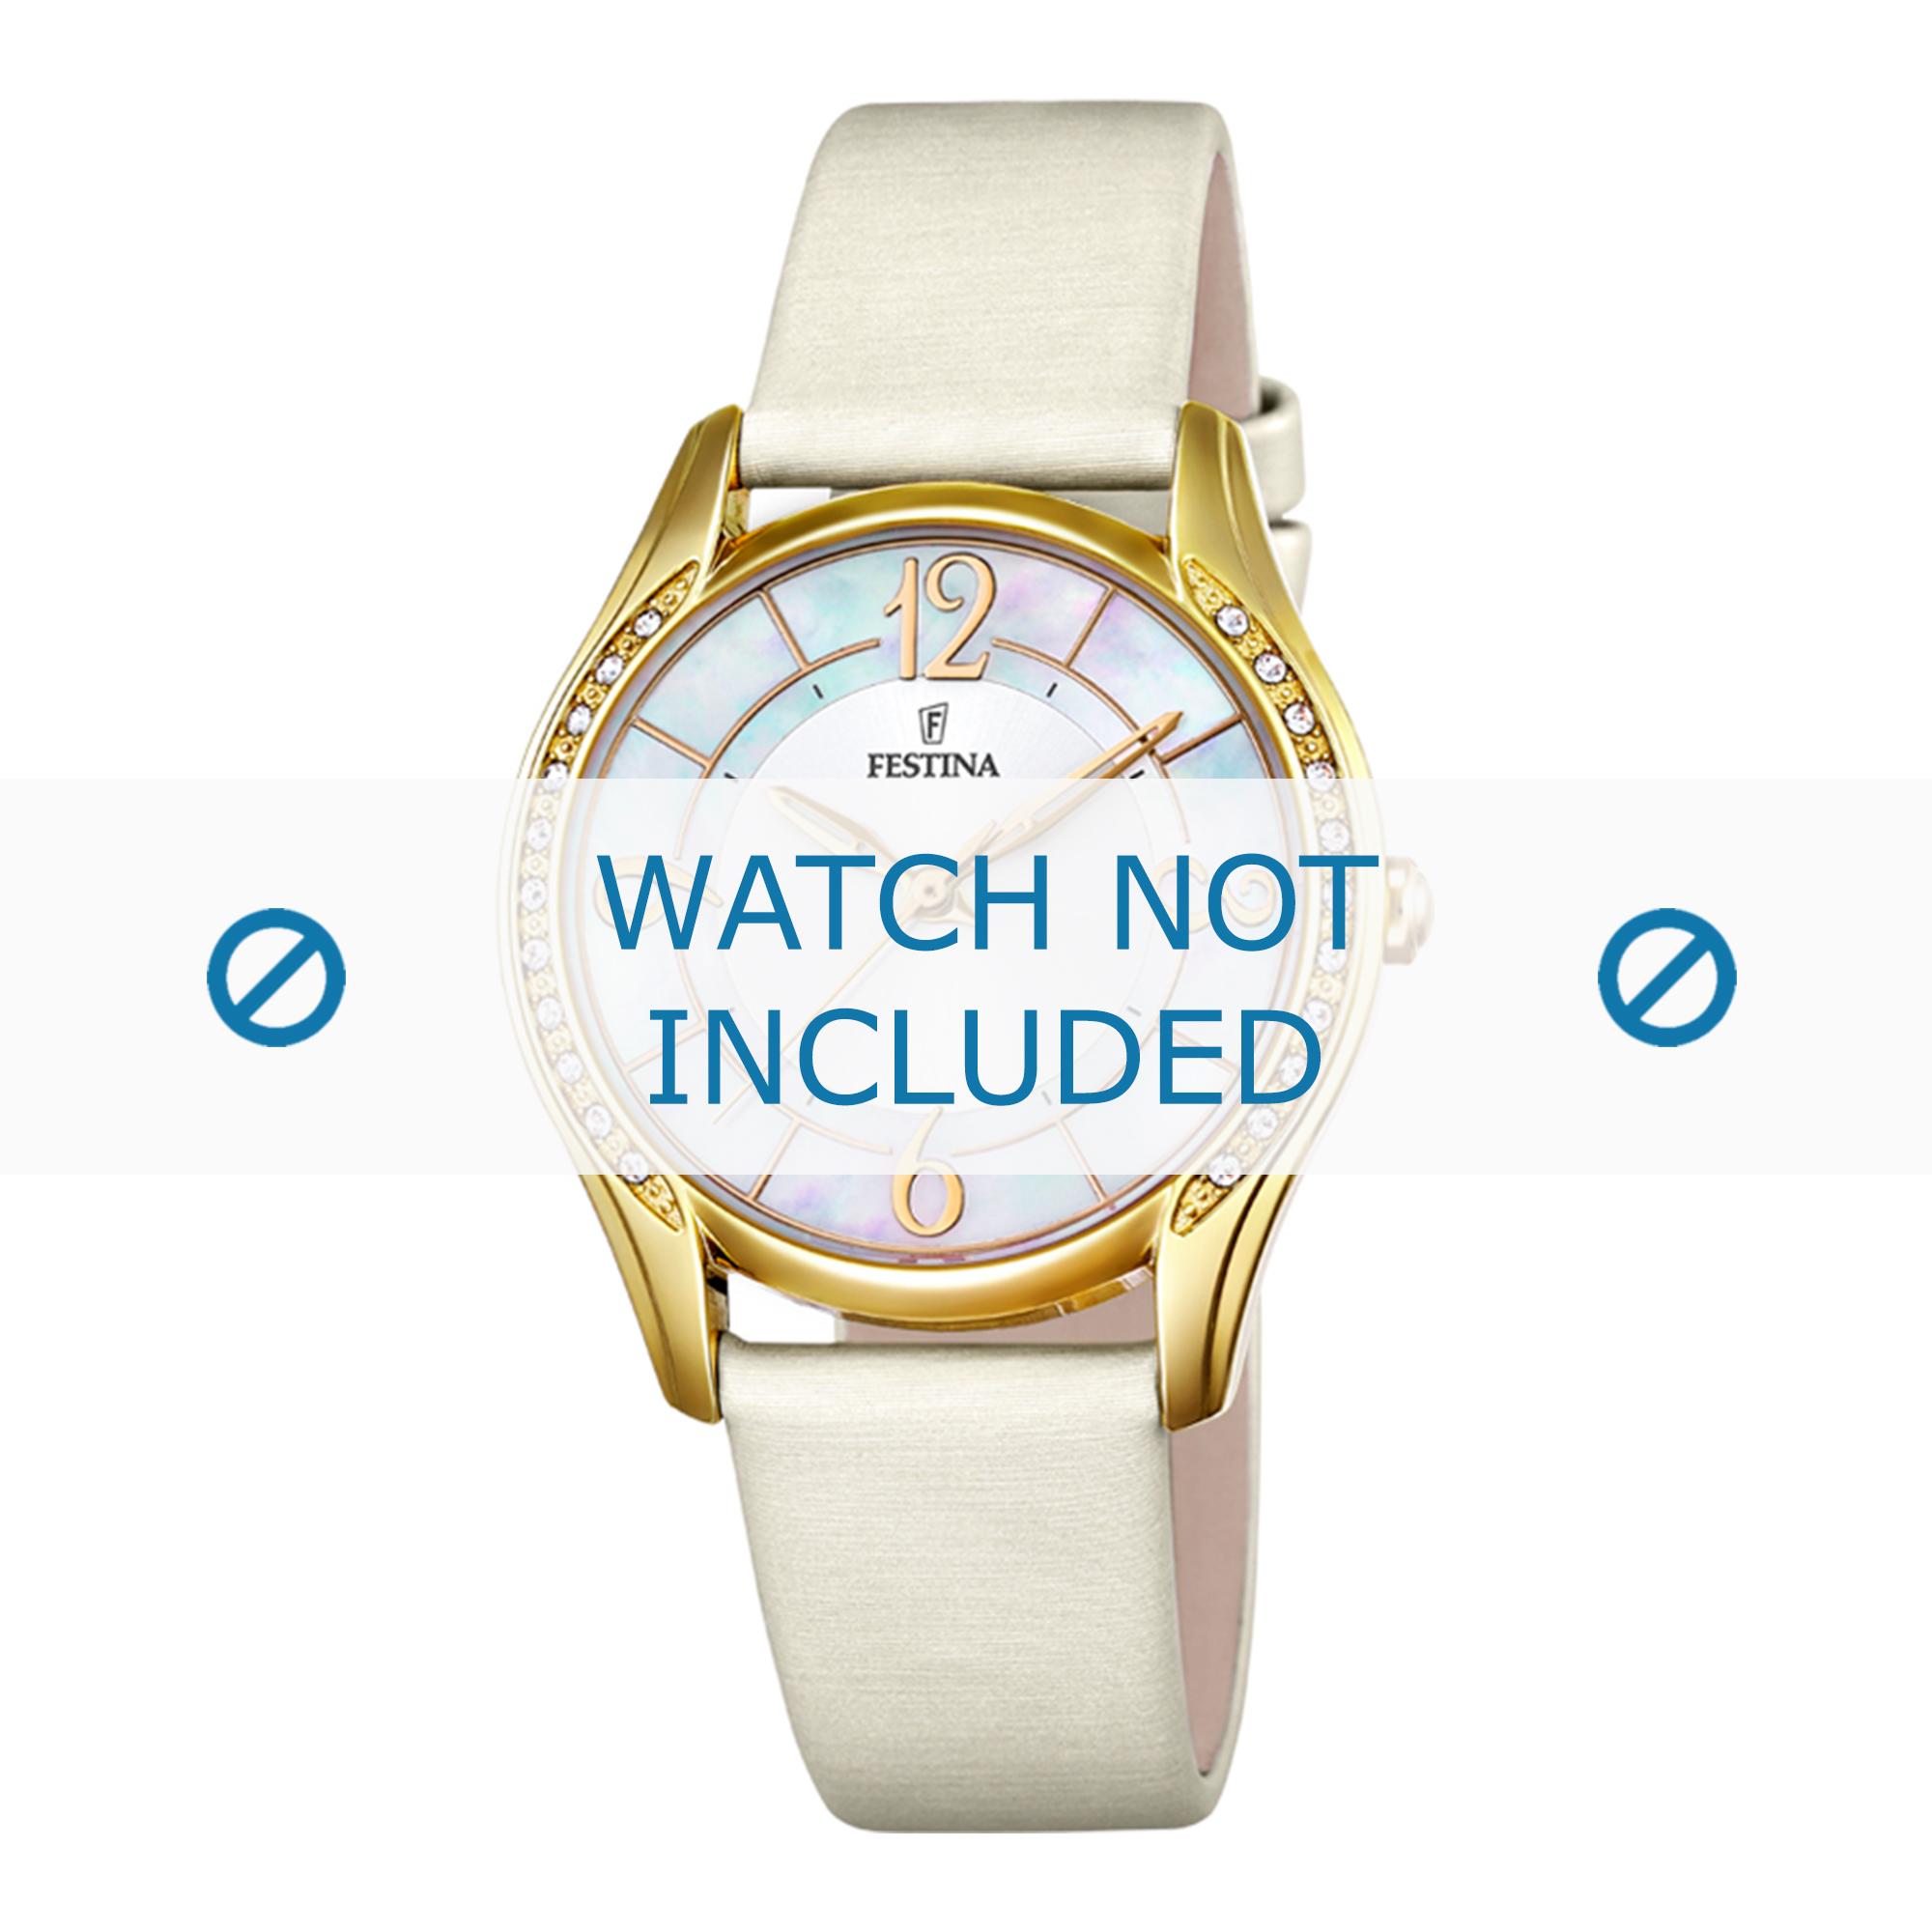 Festina horlogeband F16945-1 Leder Cream wit / Beige / Ivoor 18mm